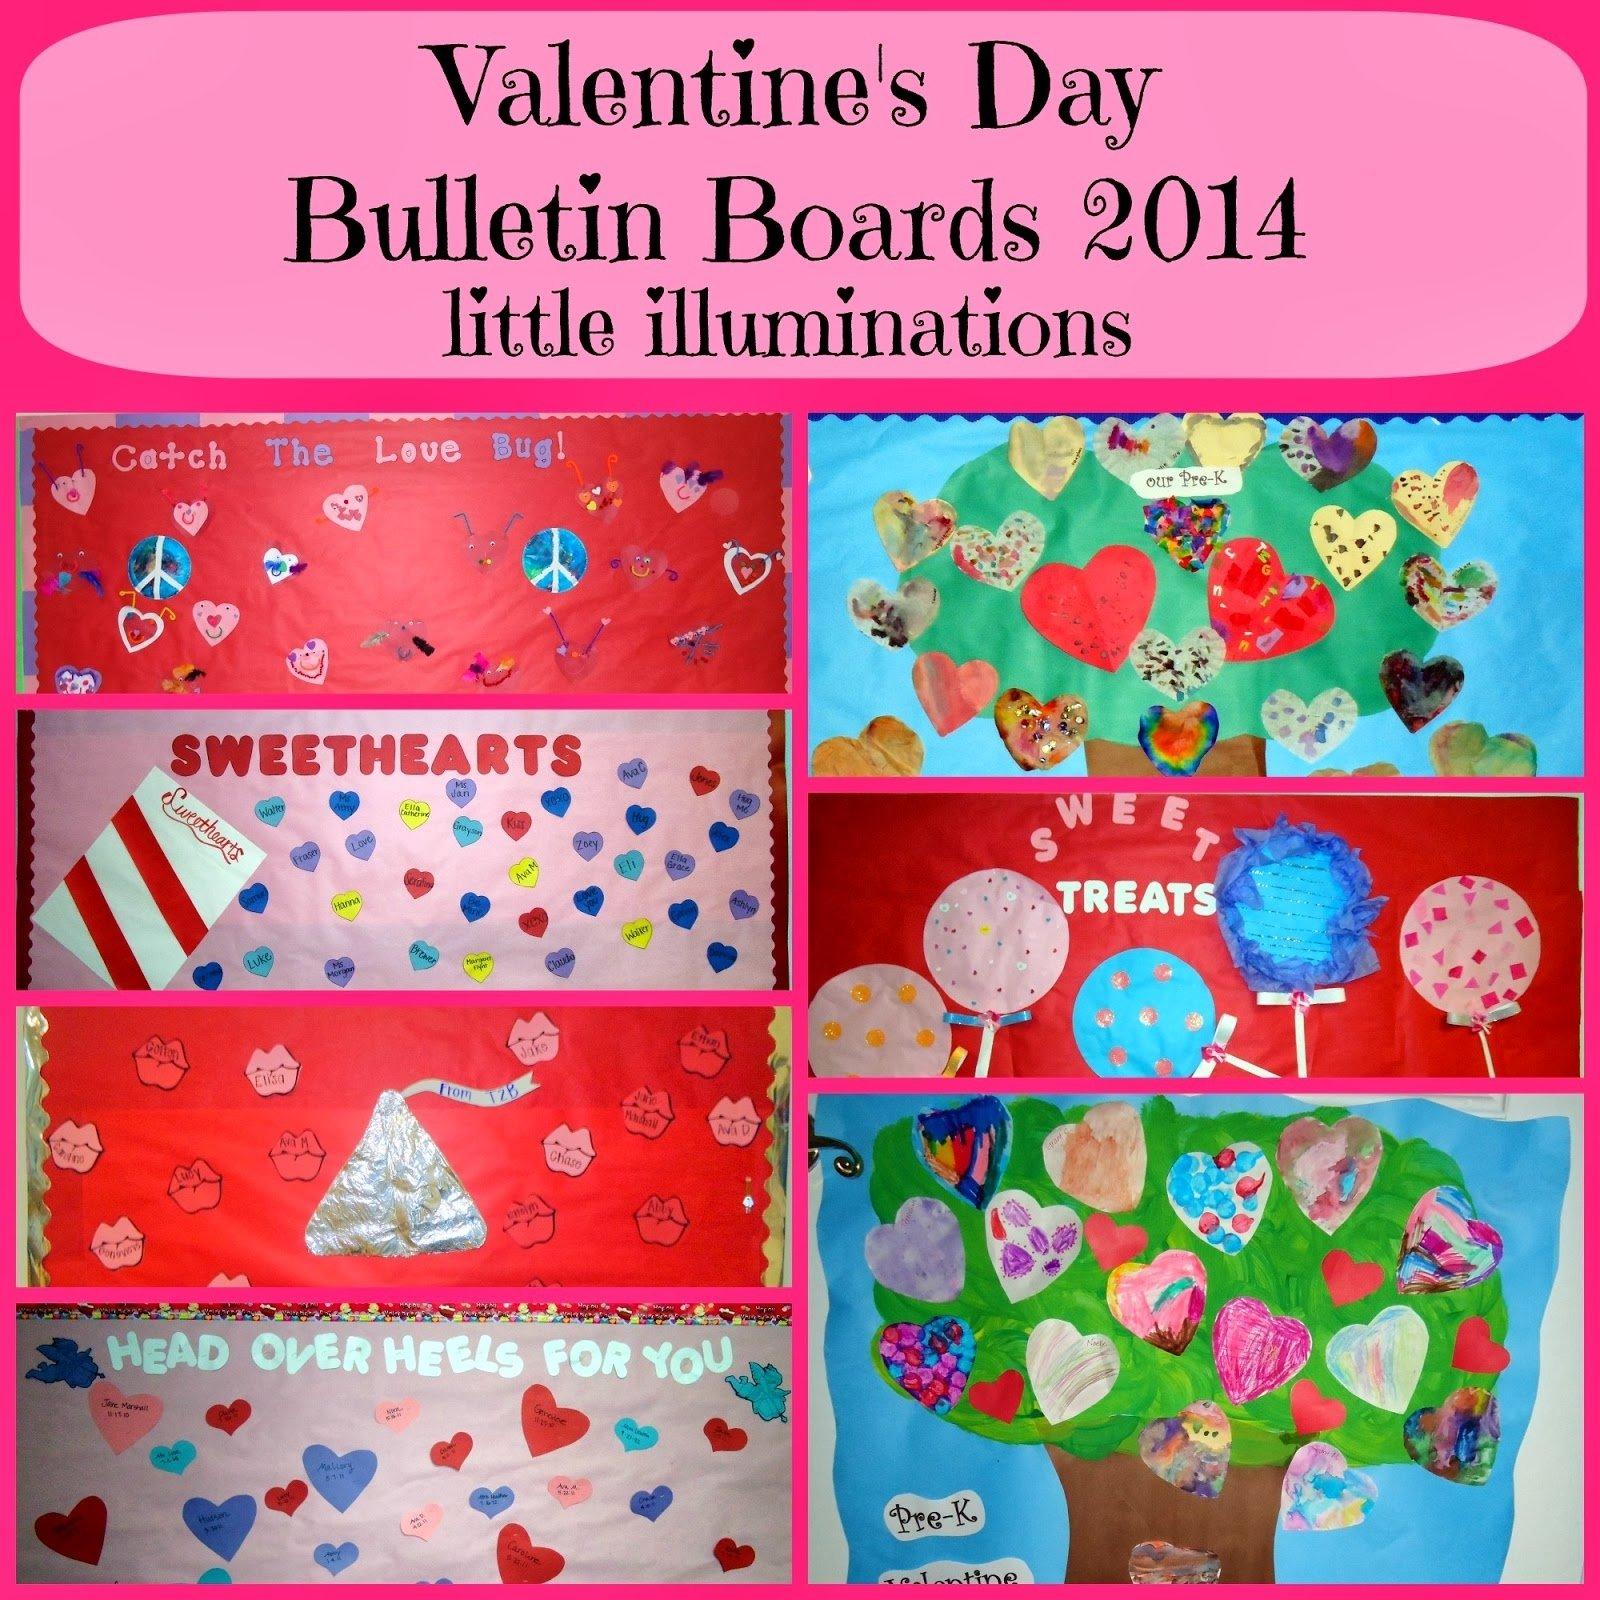 10 Stunning Valentines Day Bulletin Board Ideas For Preschool little illuminations valentines day bulletin boards 2014 3